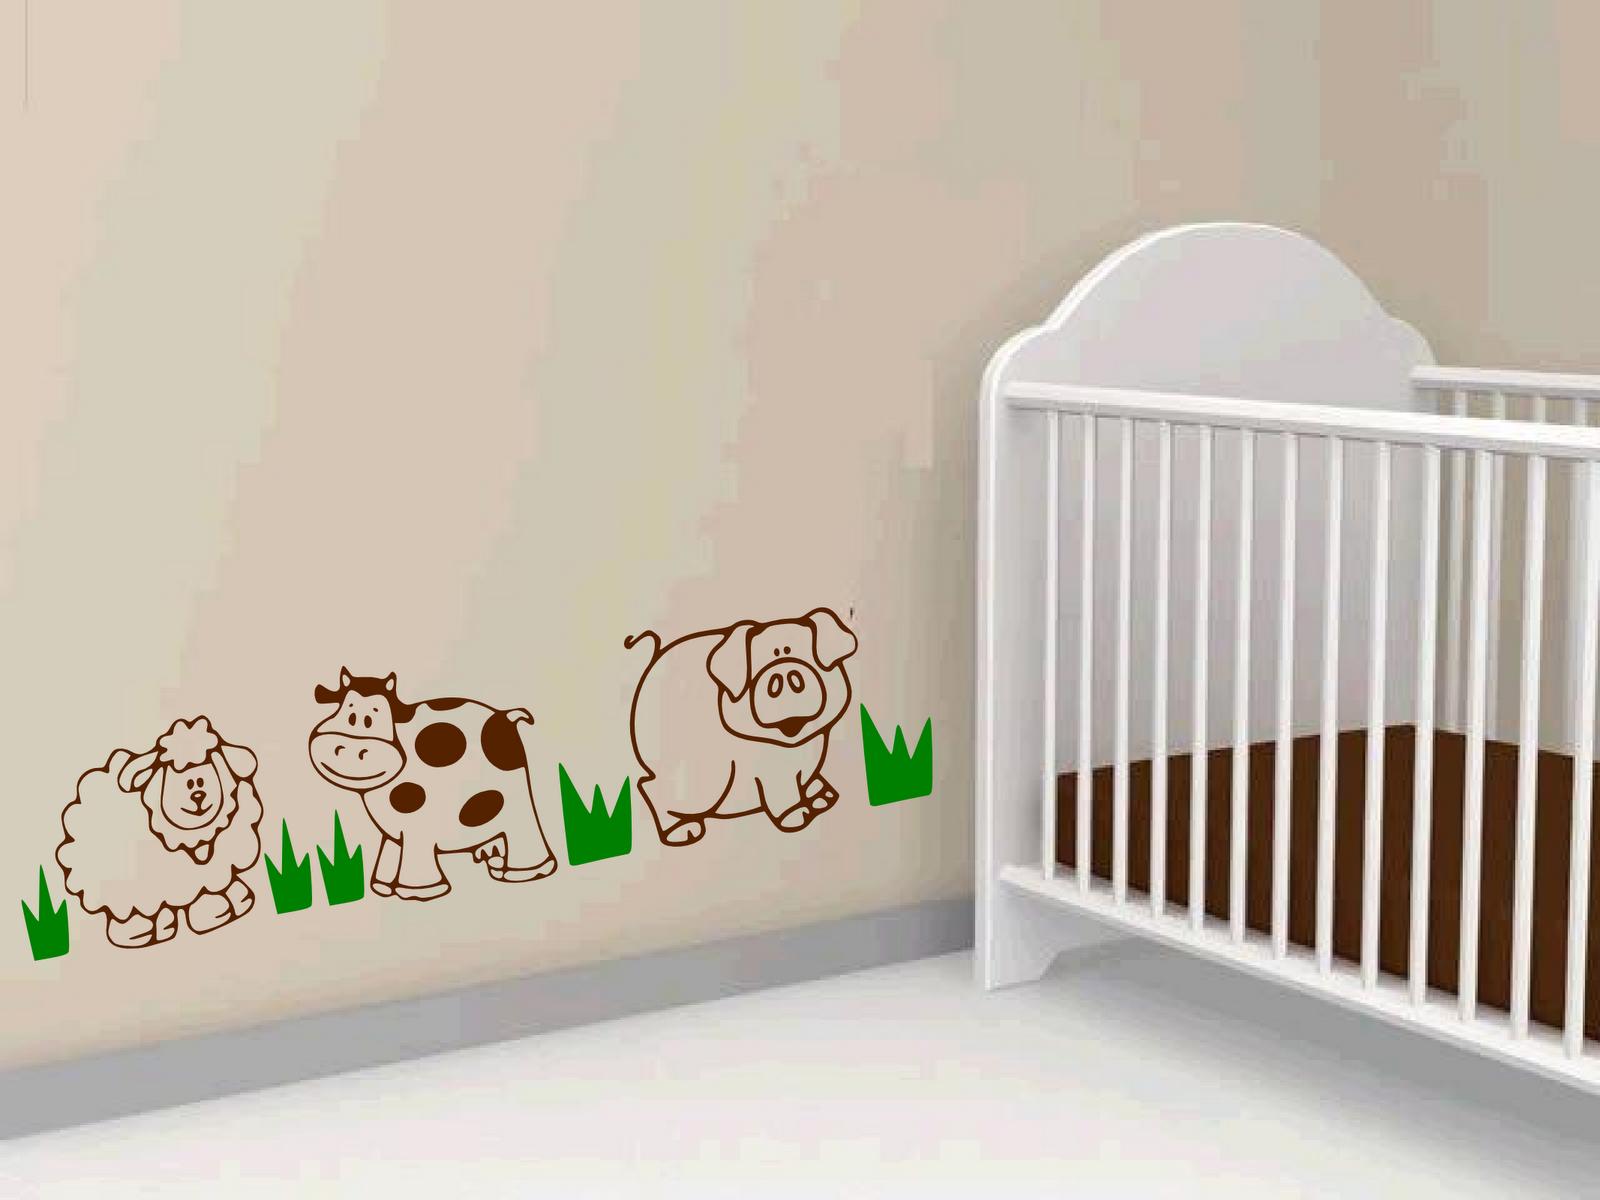 Vinilos decorativos para tu hogar cuartos infantiles - Vinilos decorativos hogar ...